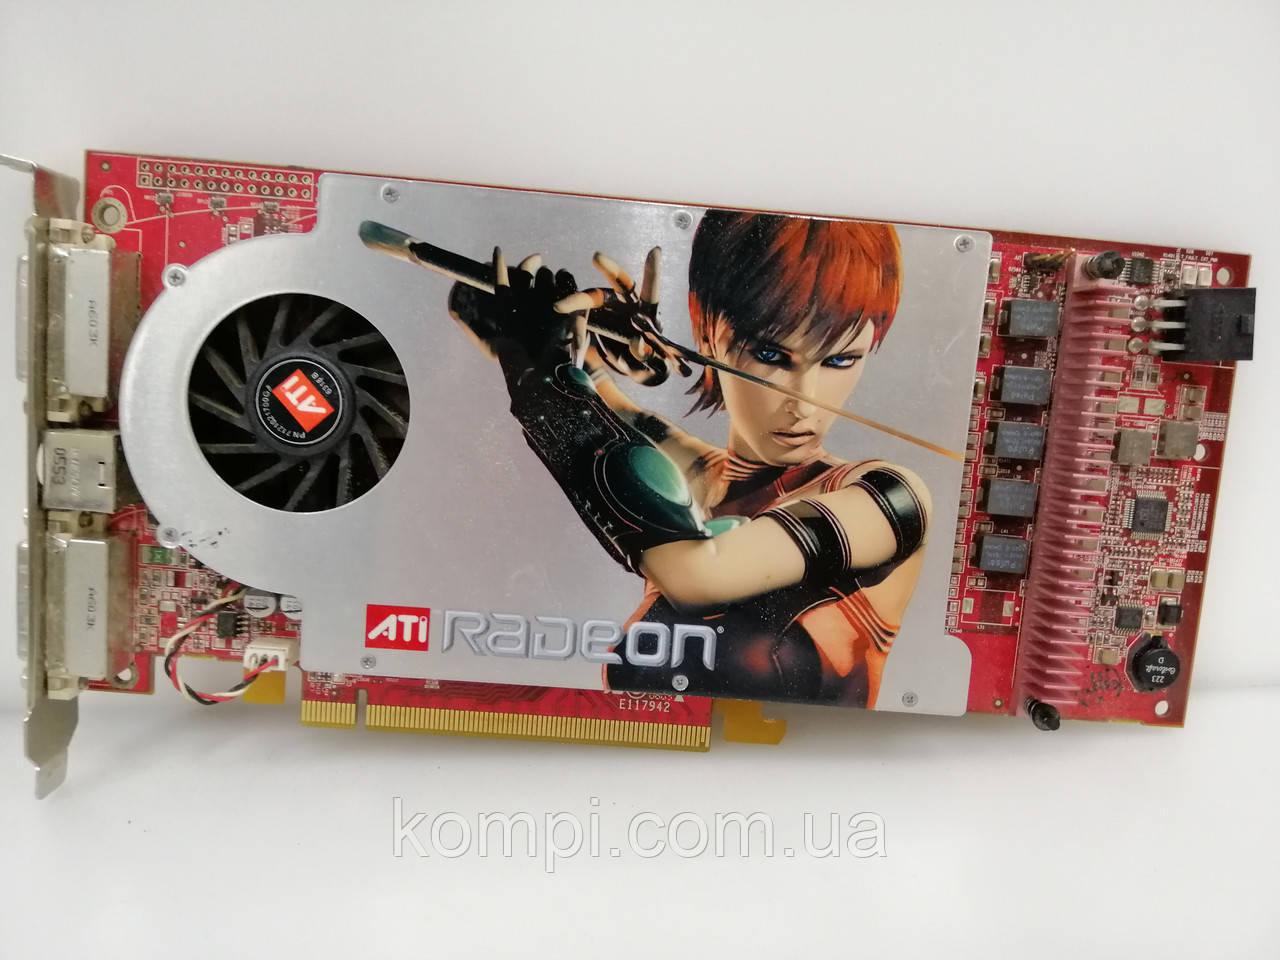 Видеокарта ATI RADEON X1800 GTO 256MB / 256 BIT PCI-E